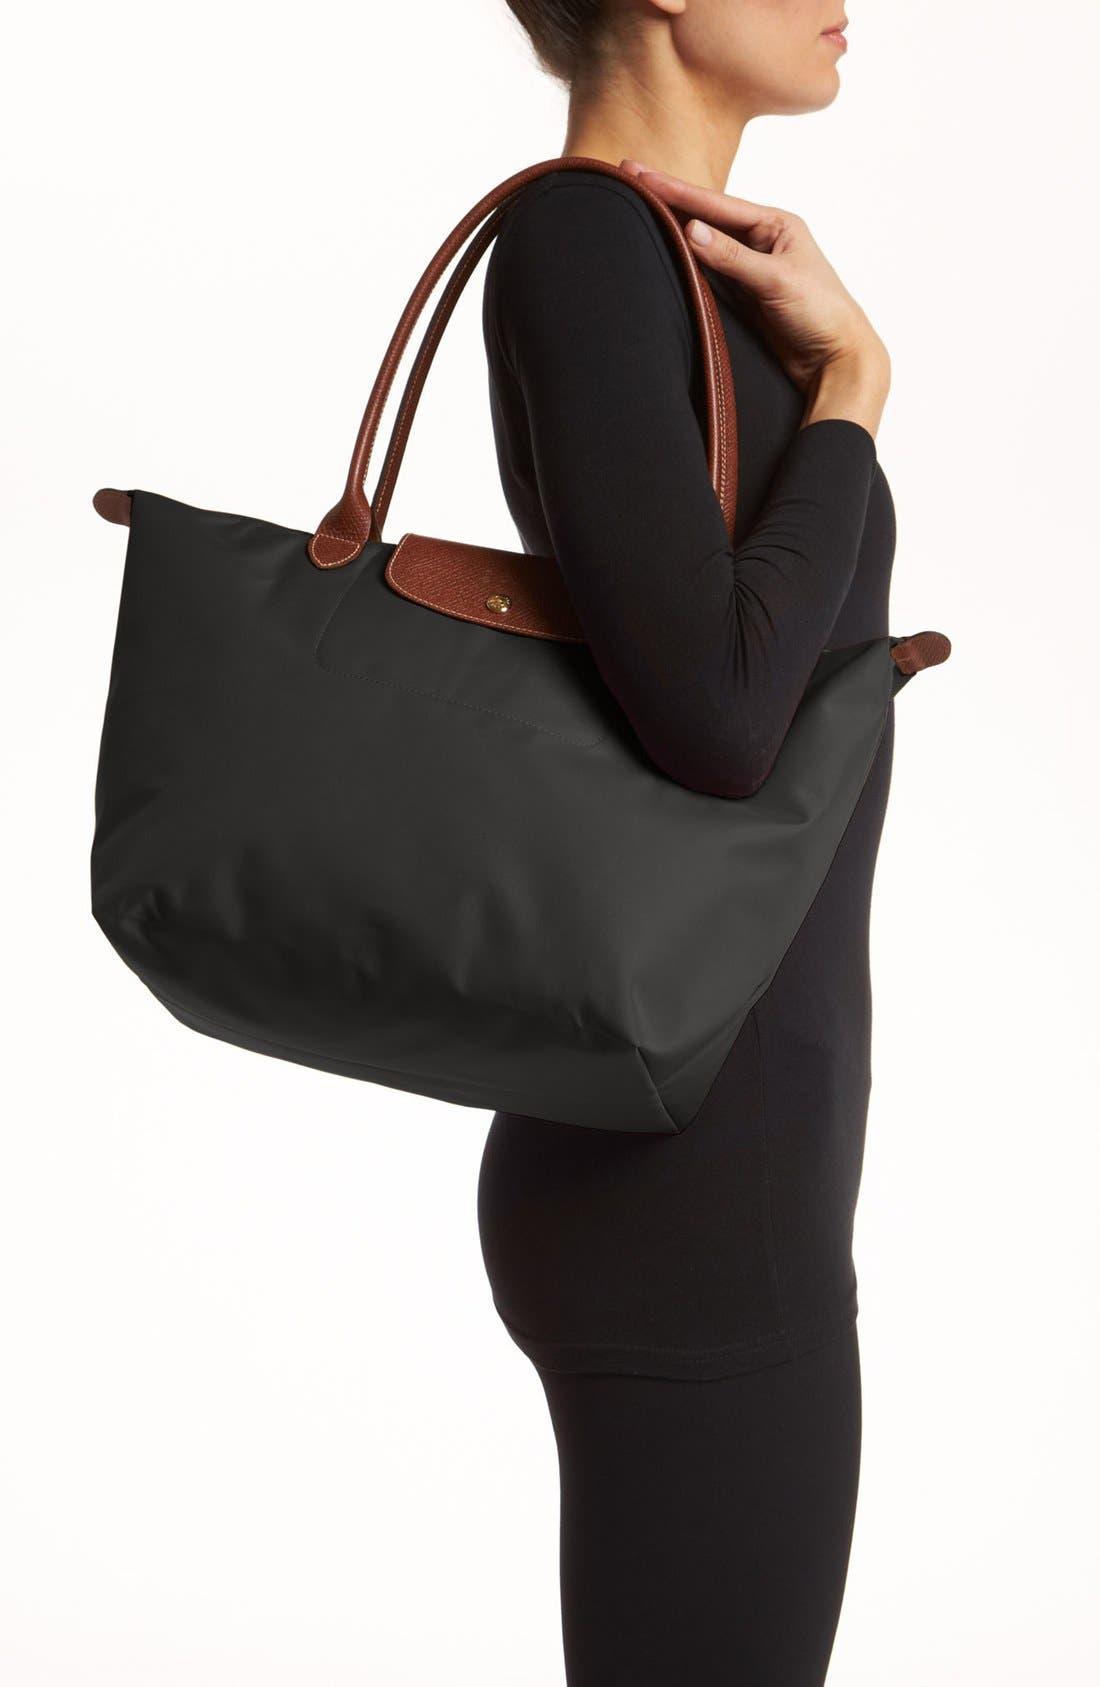 9a8755a51953b Handbags   Wallets for Women